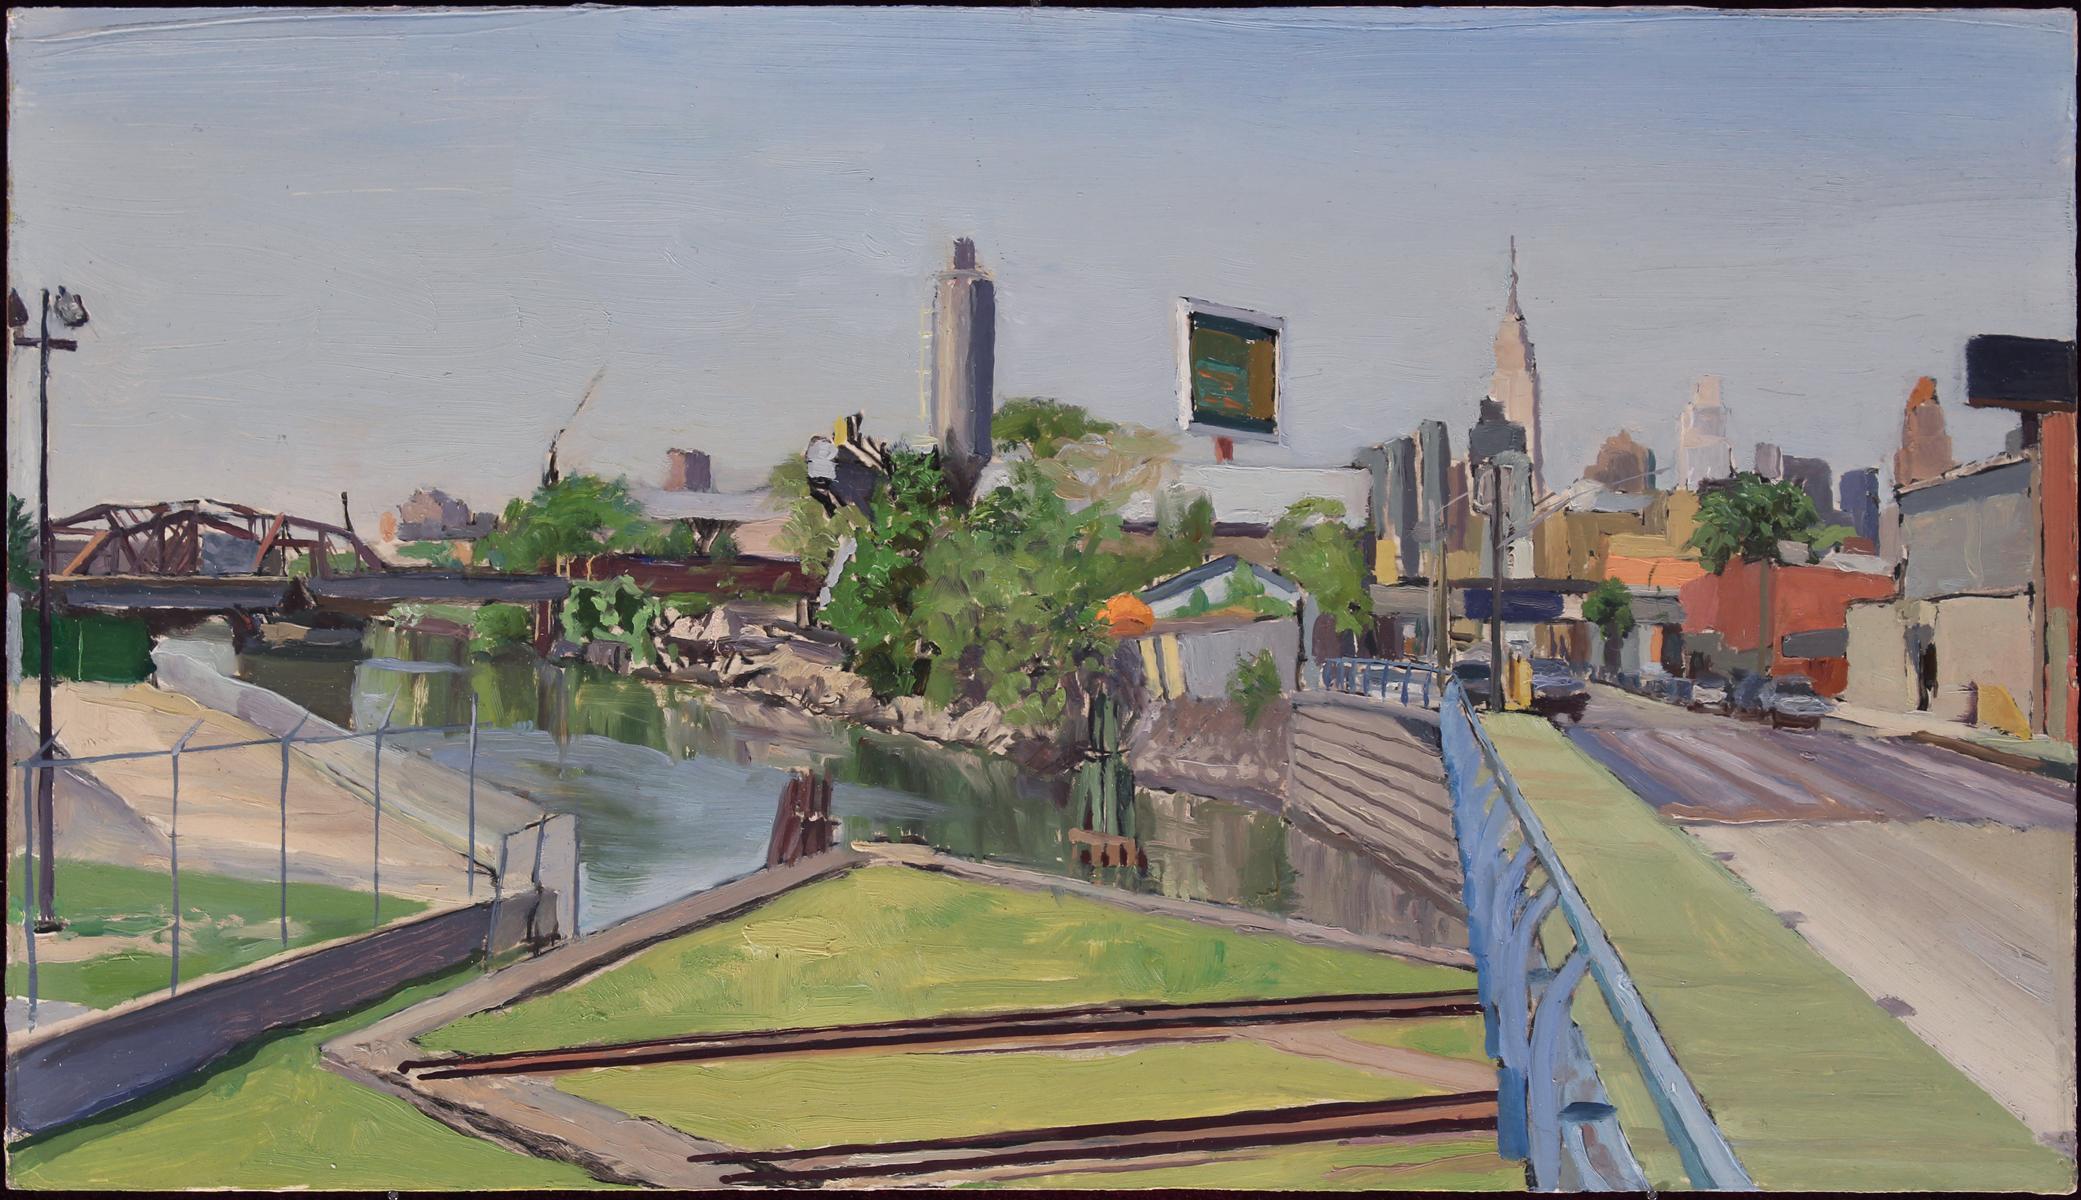 "BORDEN AVENUE (study) oil on panel 9 x 16"" 2017"